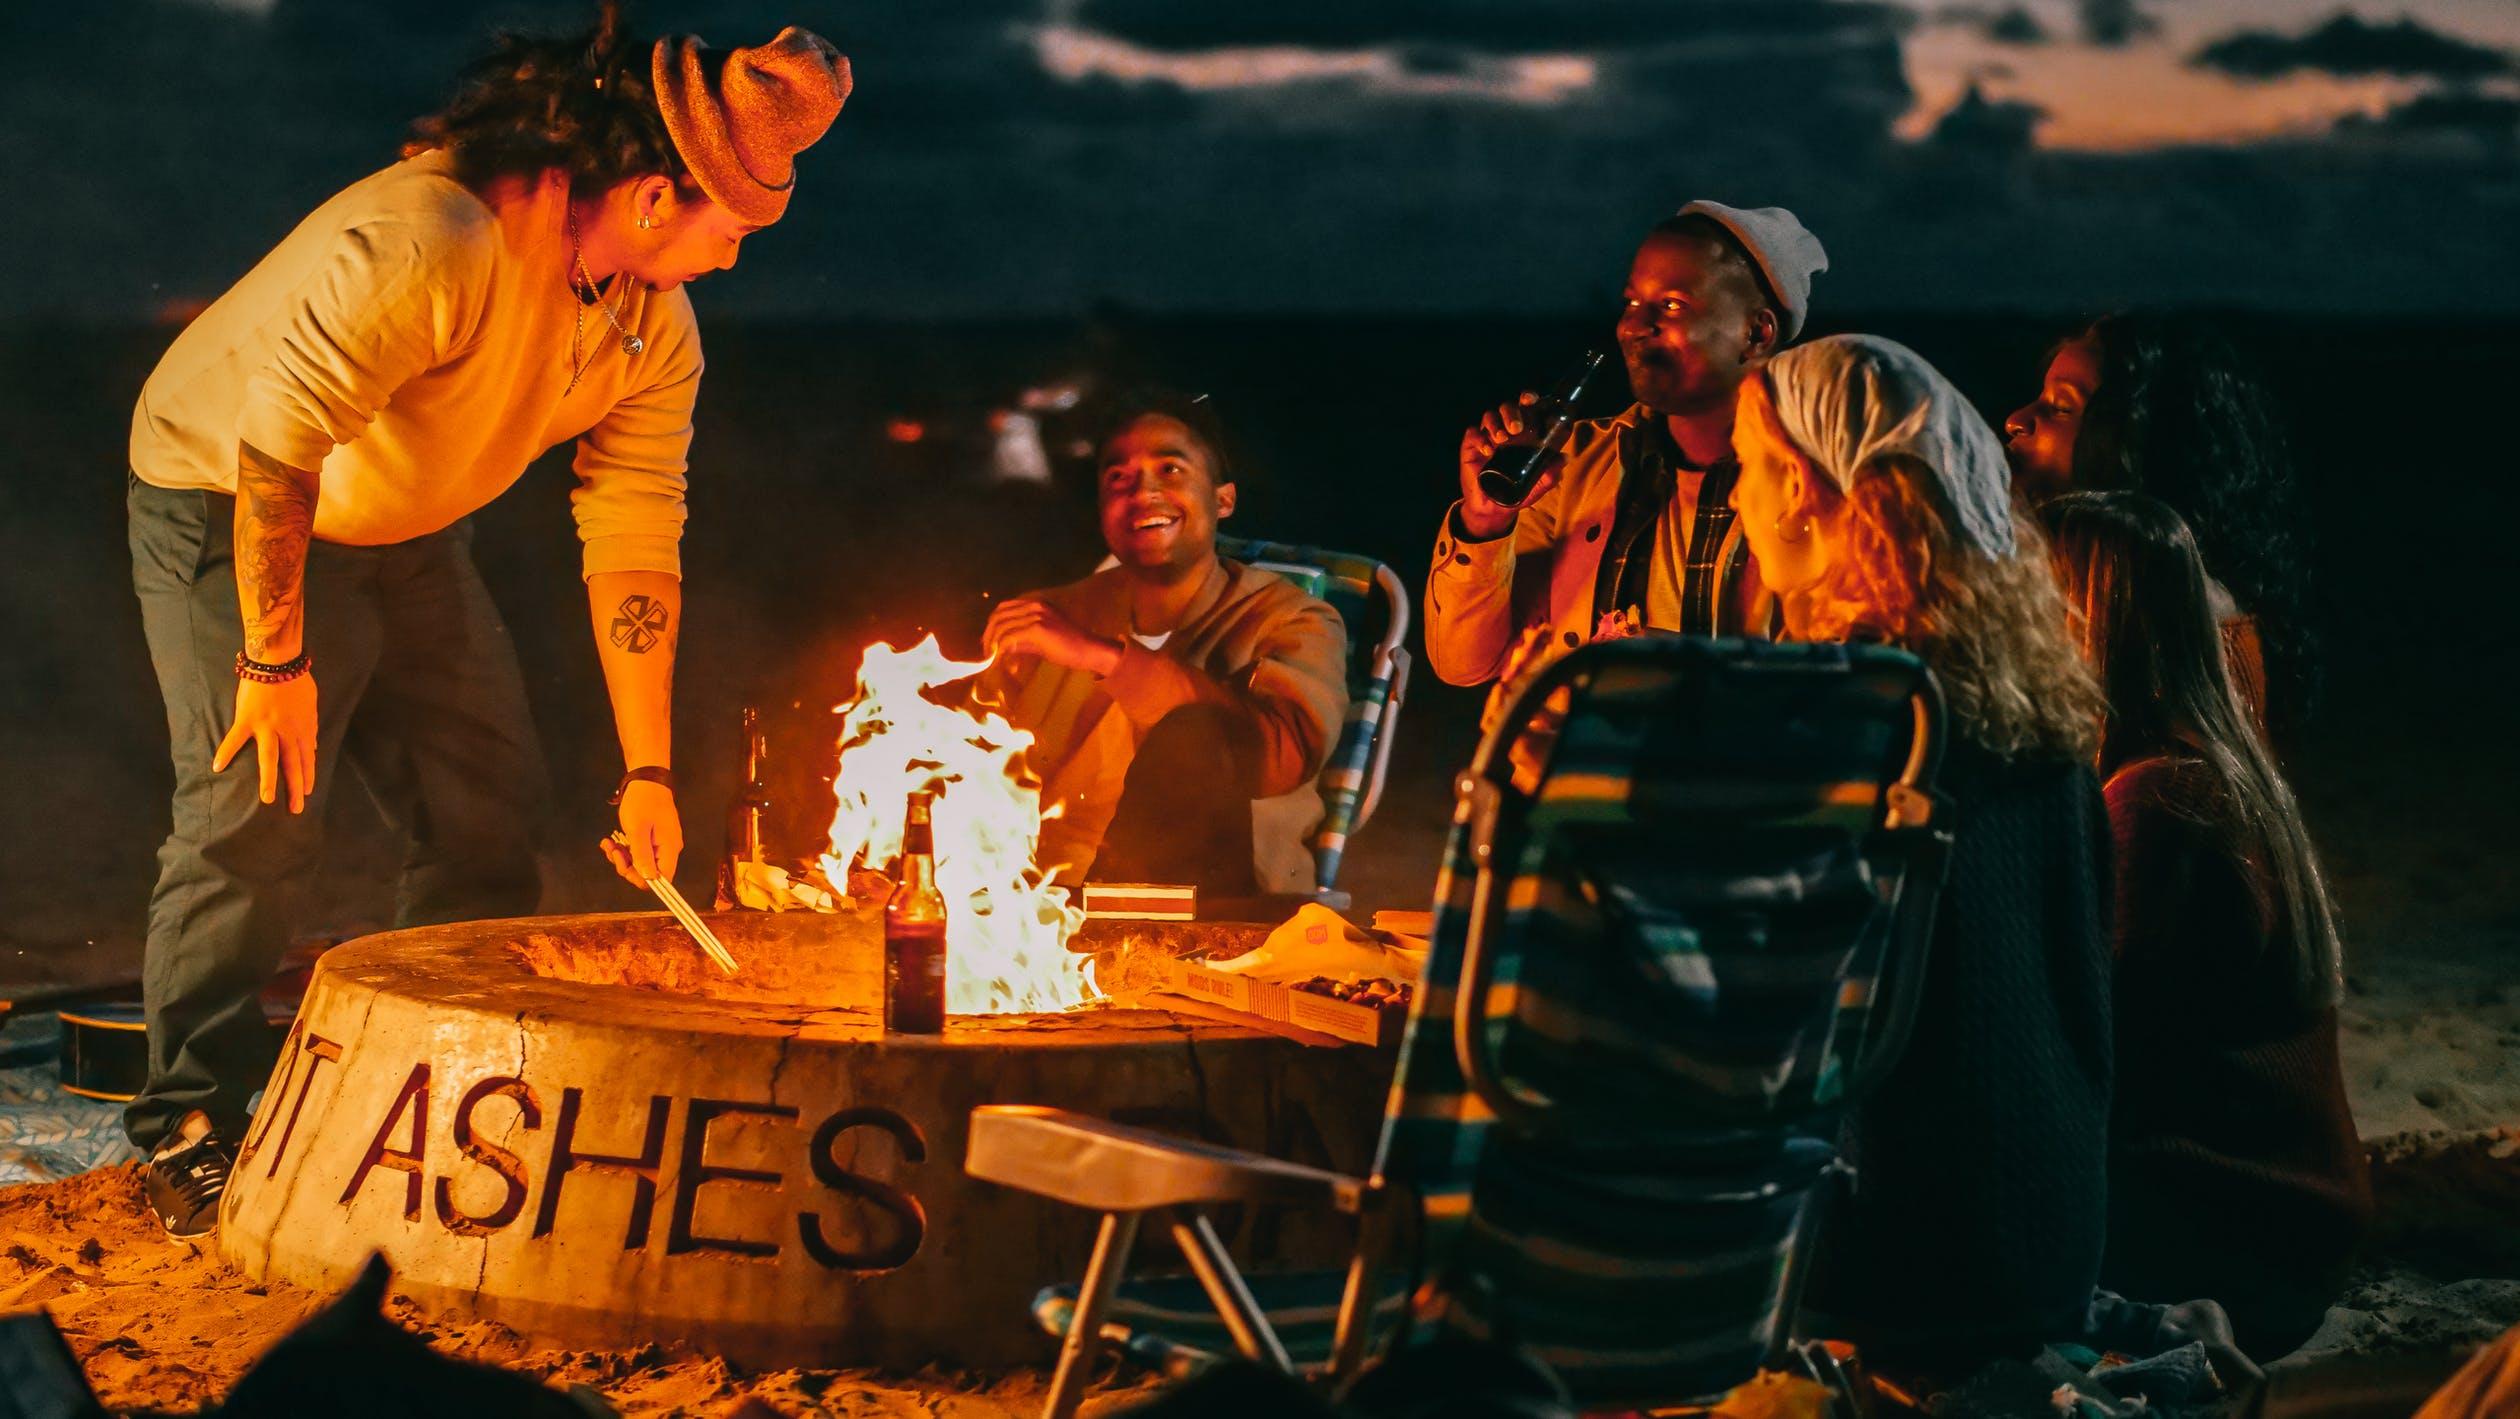 People gather around a bonfire